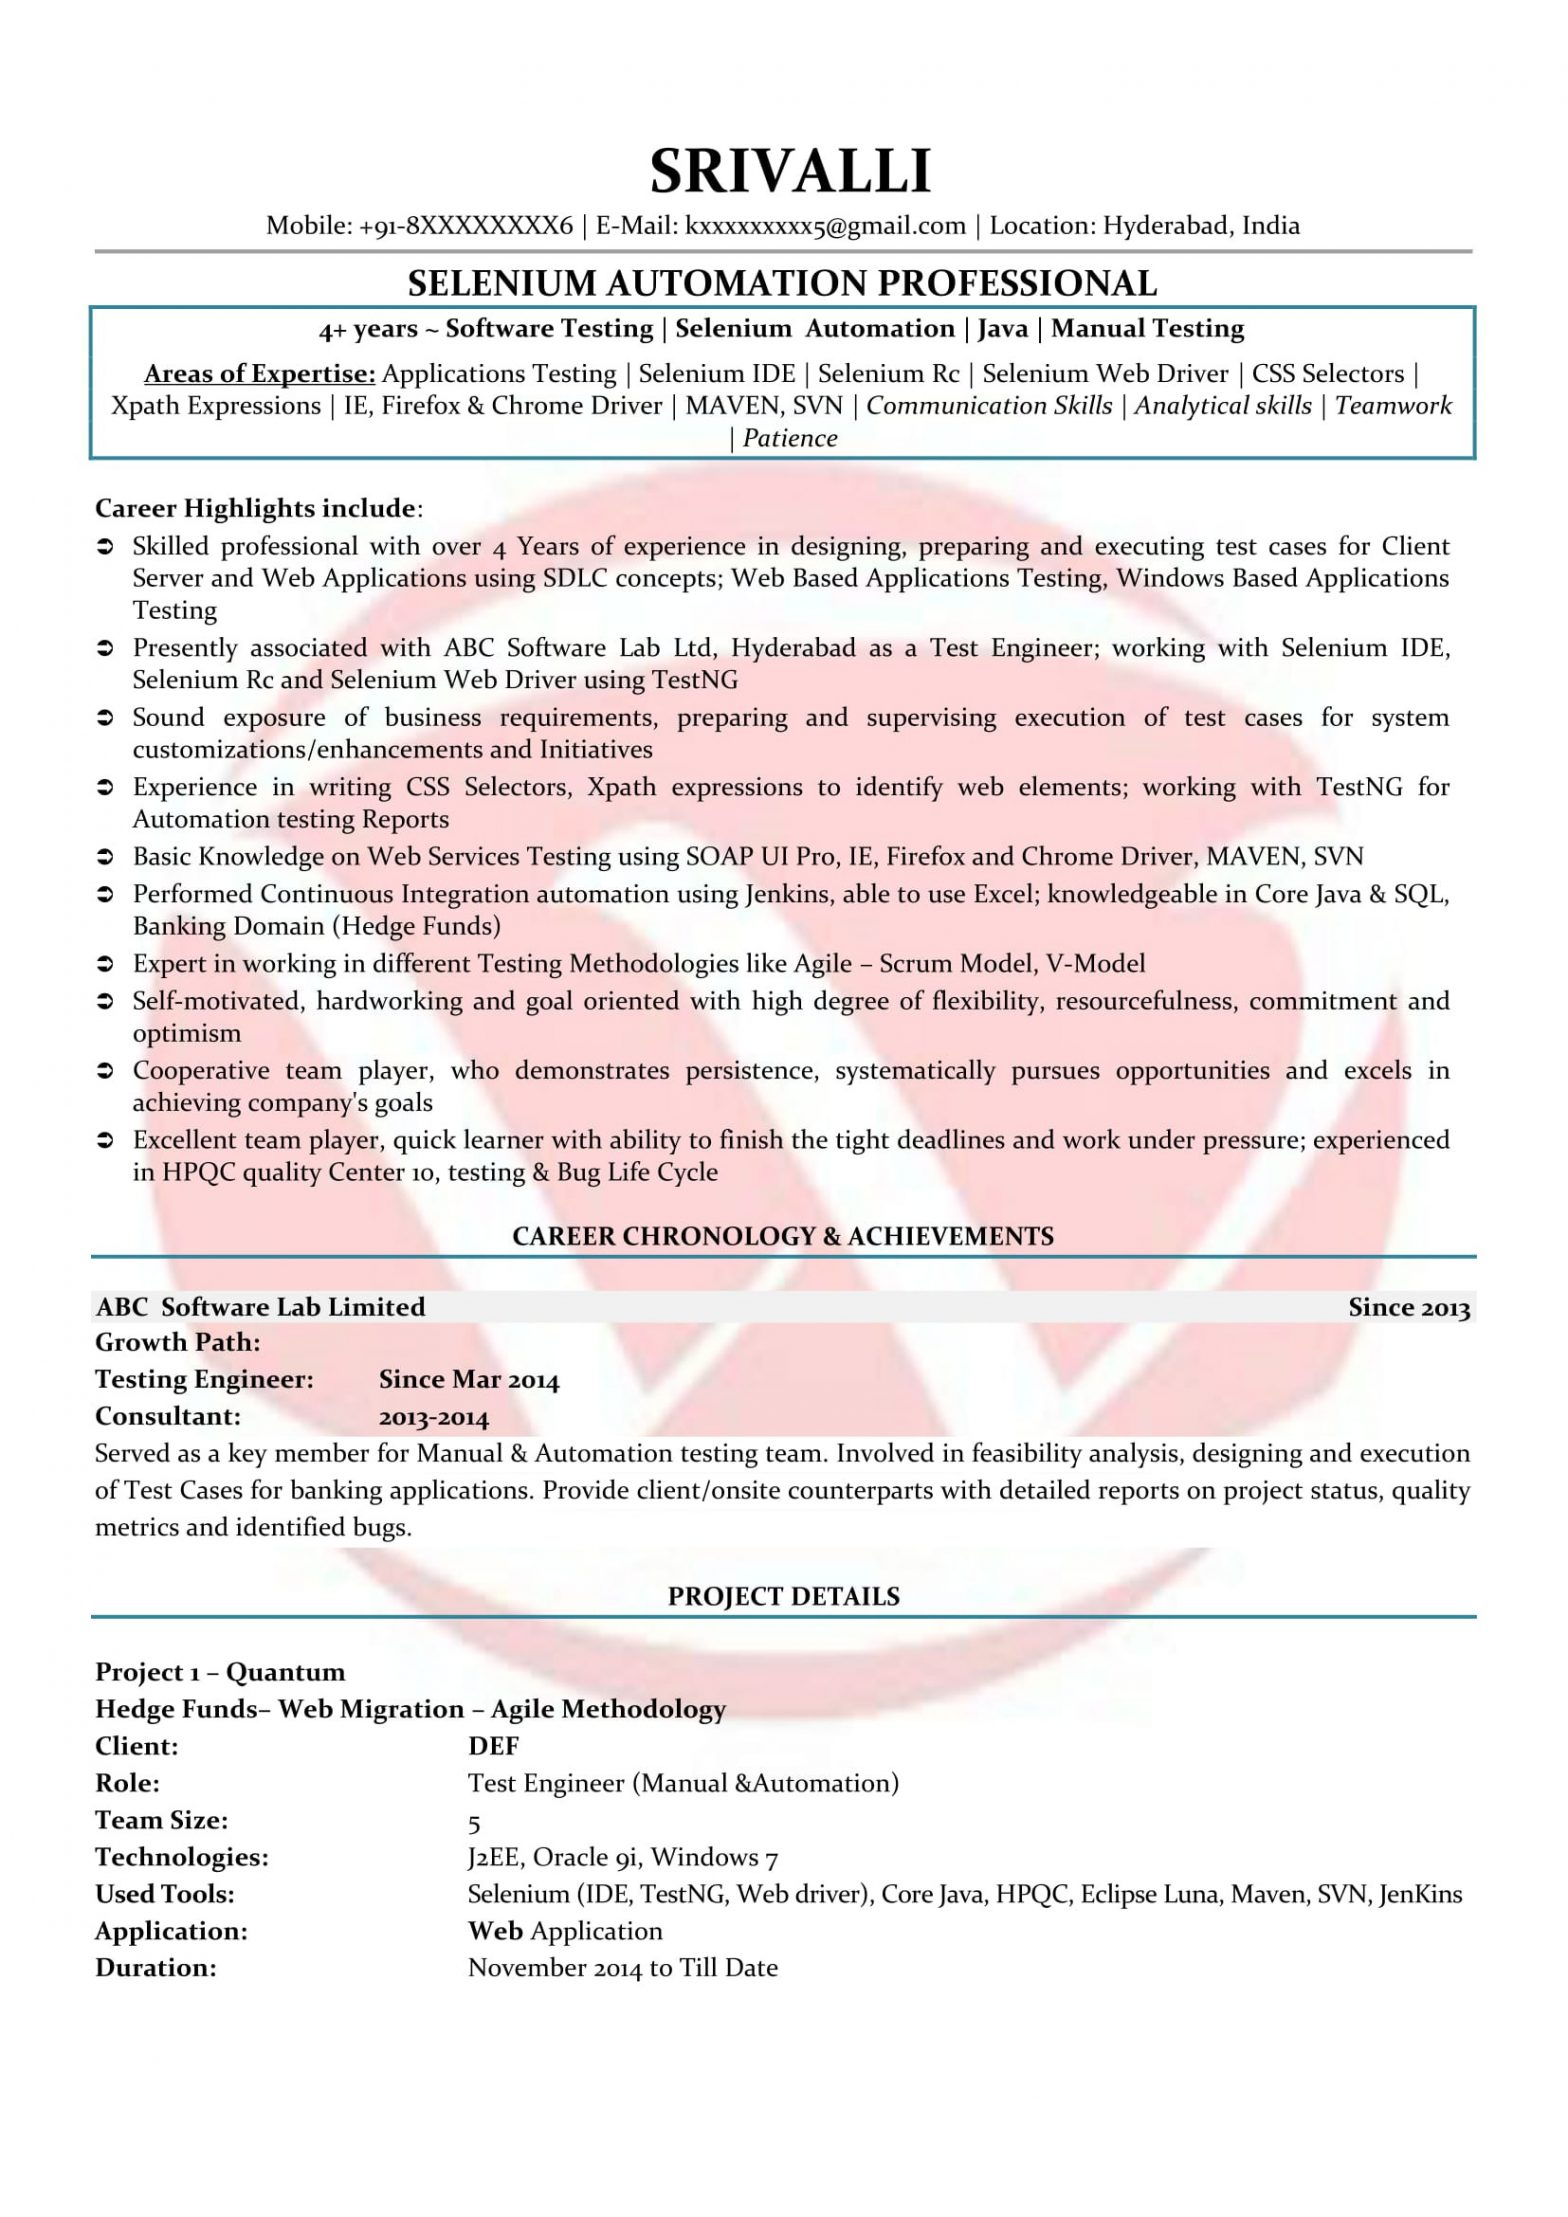 Sample Resume for Selenium Automation Tester Selenium Sample Resumes, Download Resume format Templates!